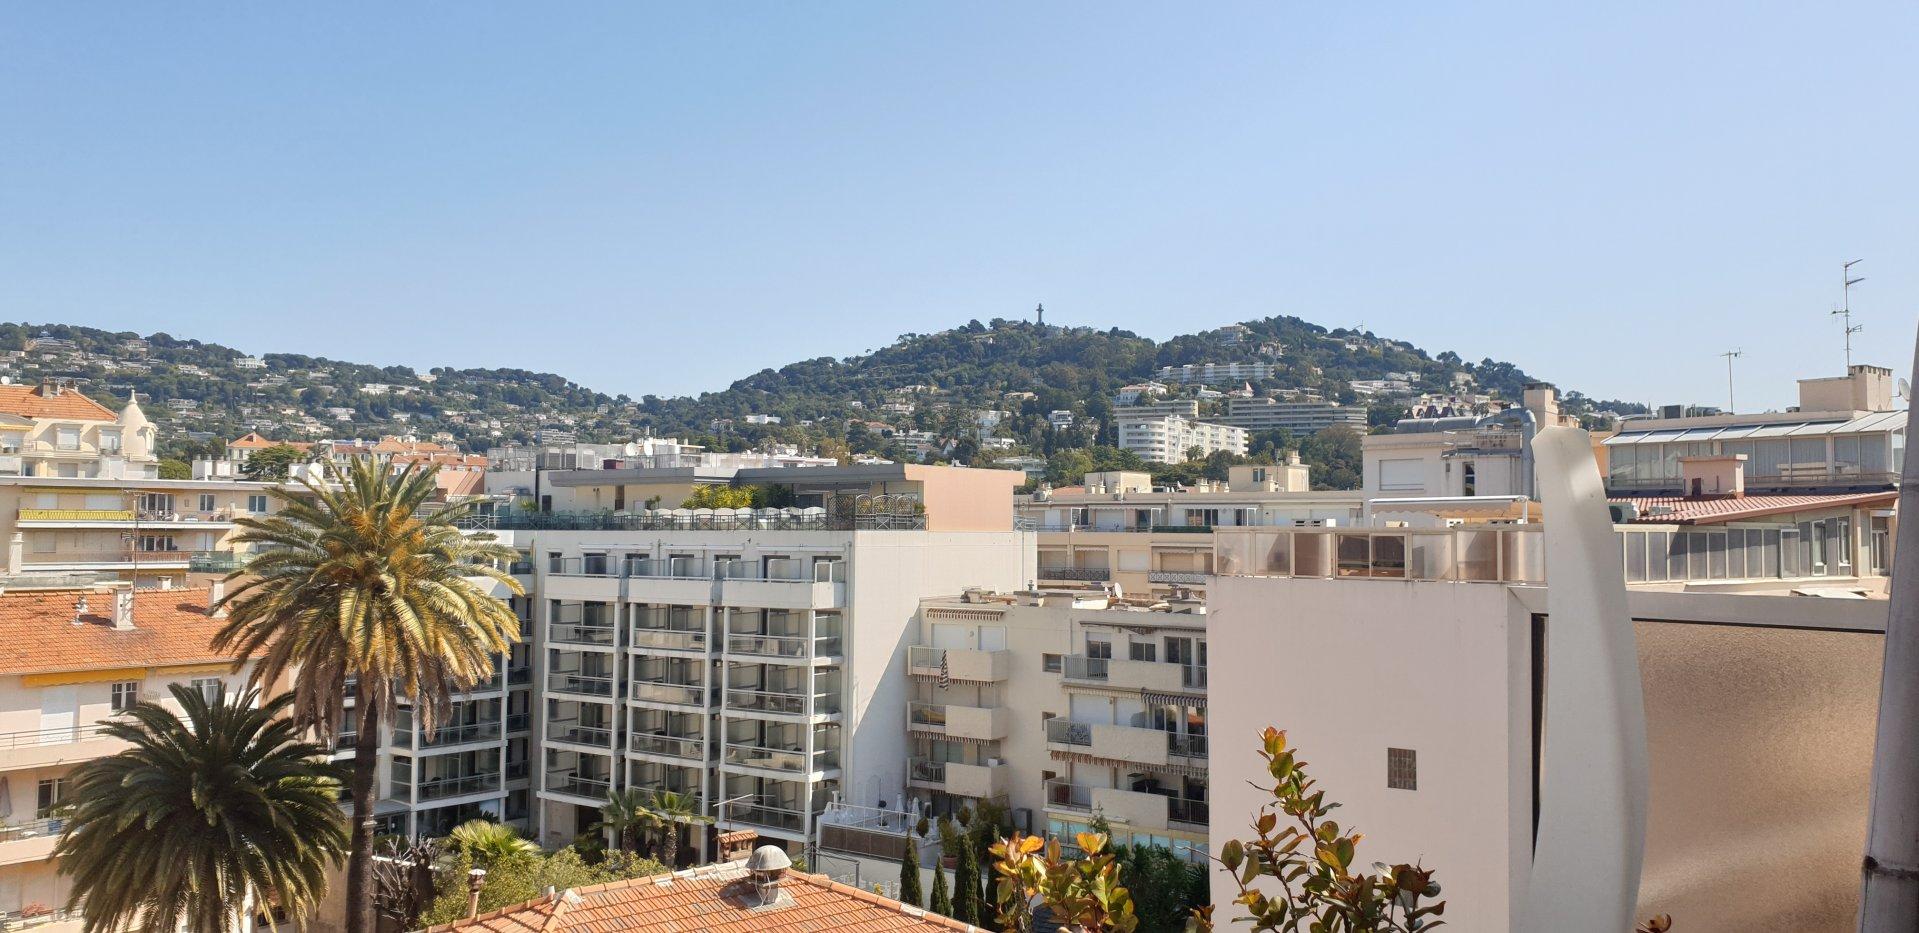 Seasonal rental Apartment - Cannes Banane